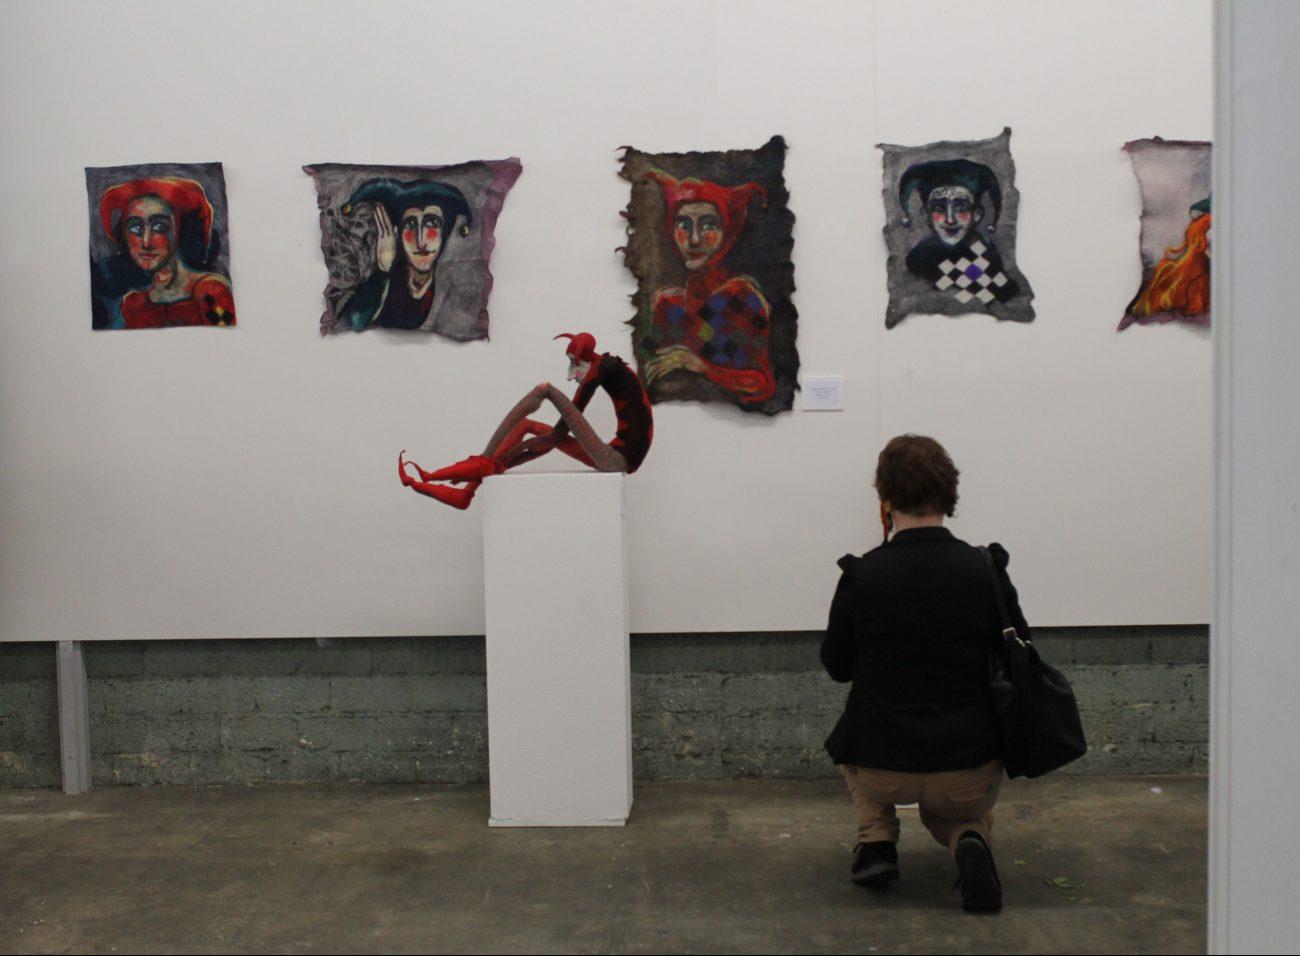 Overzichtsfoto tentoonstelling.